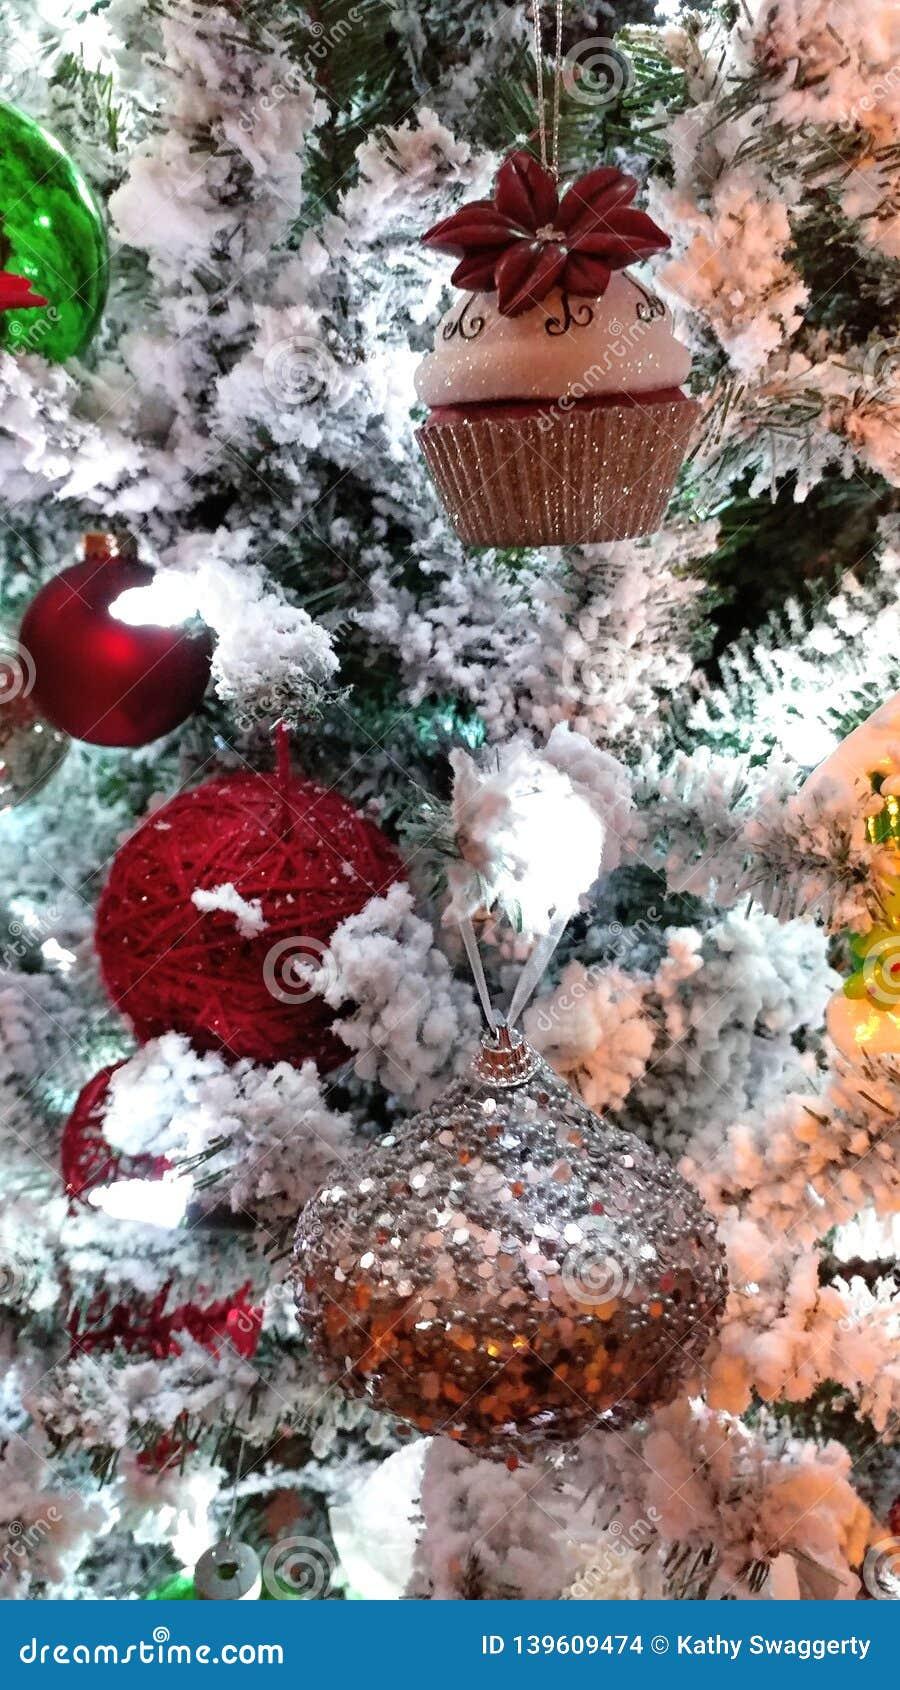 White Christmas Tree Ornaments Glam Glitter Stock Photo Image Of High Glitter 139609474